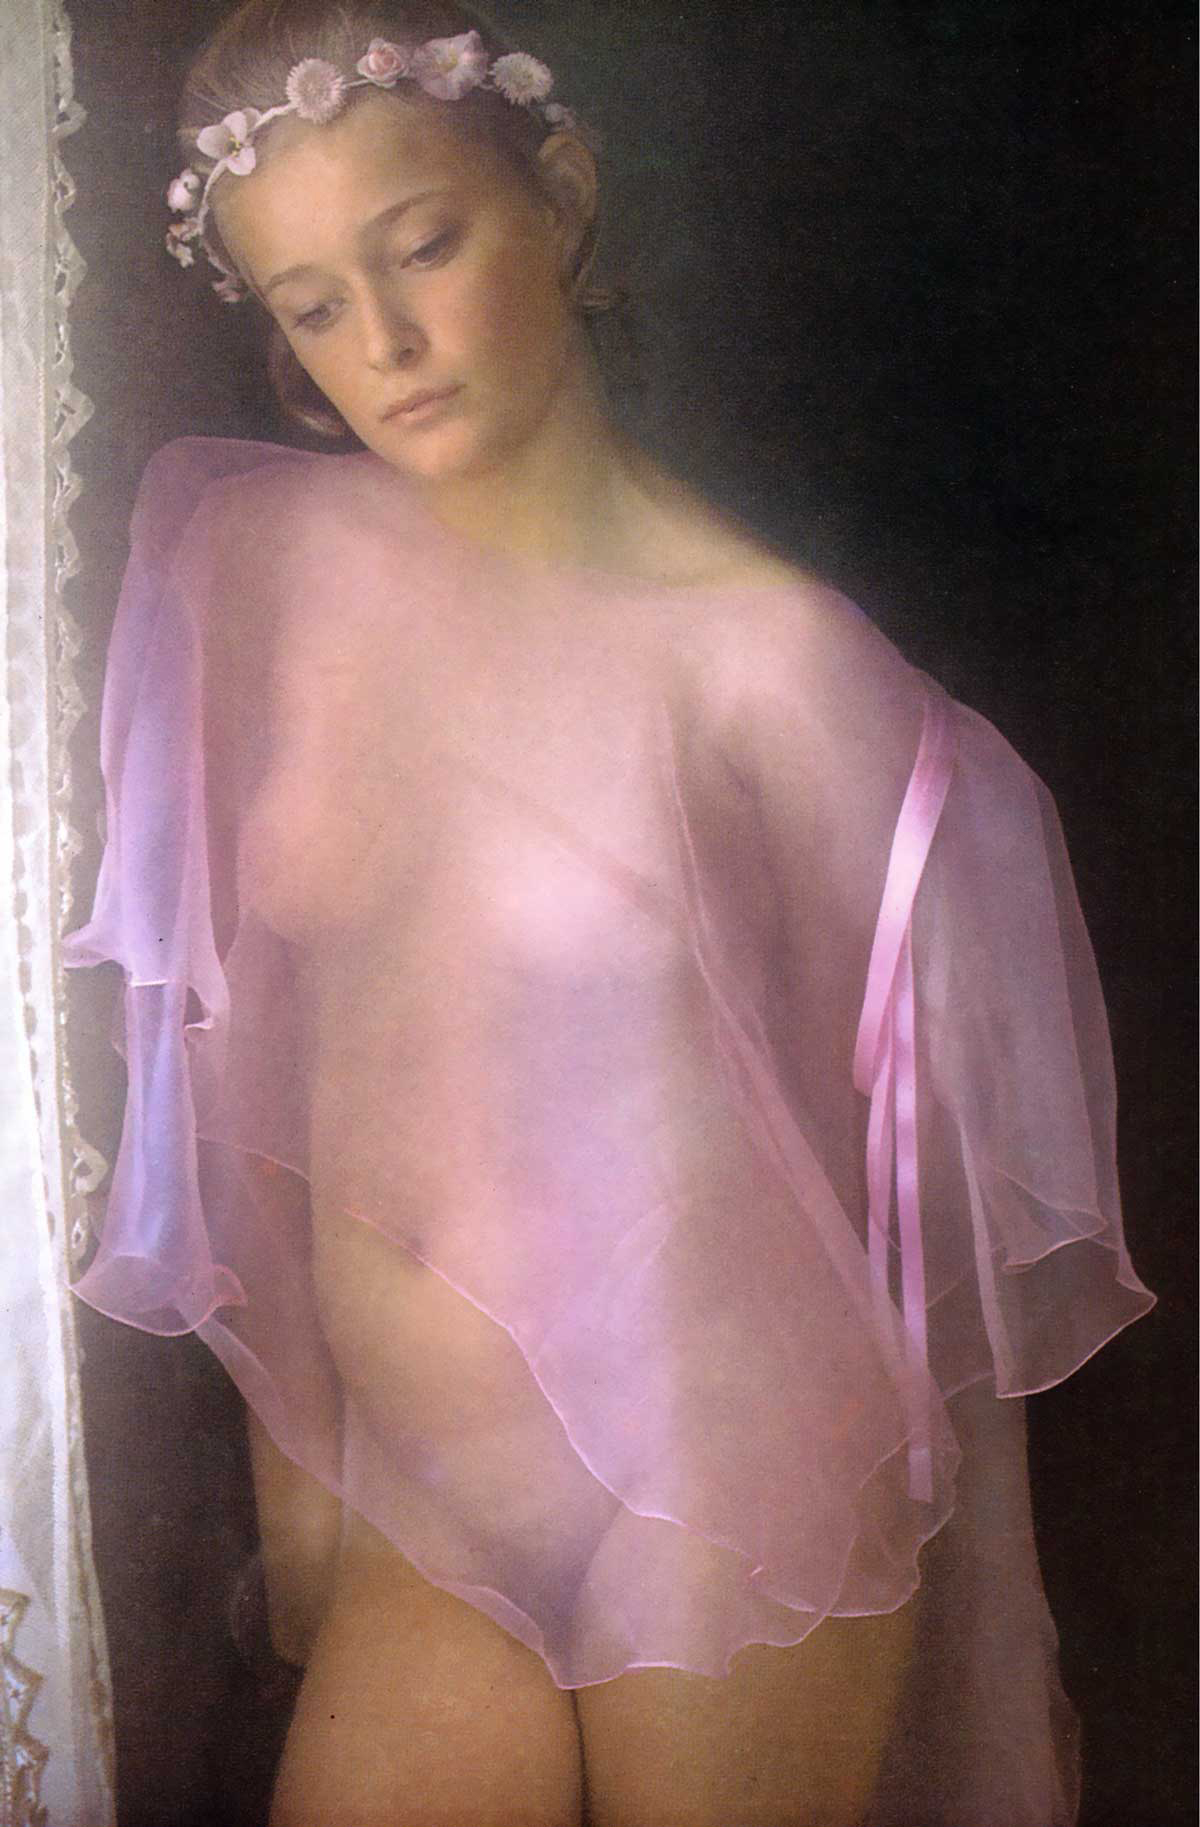 david hamilton nude videos of young girls